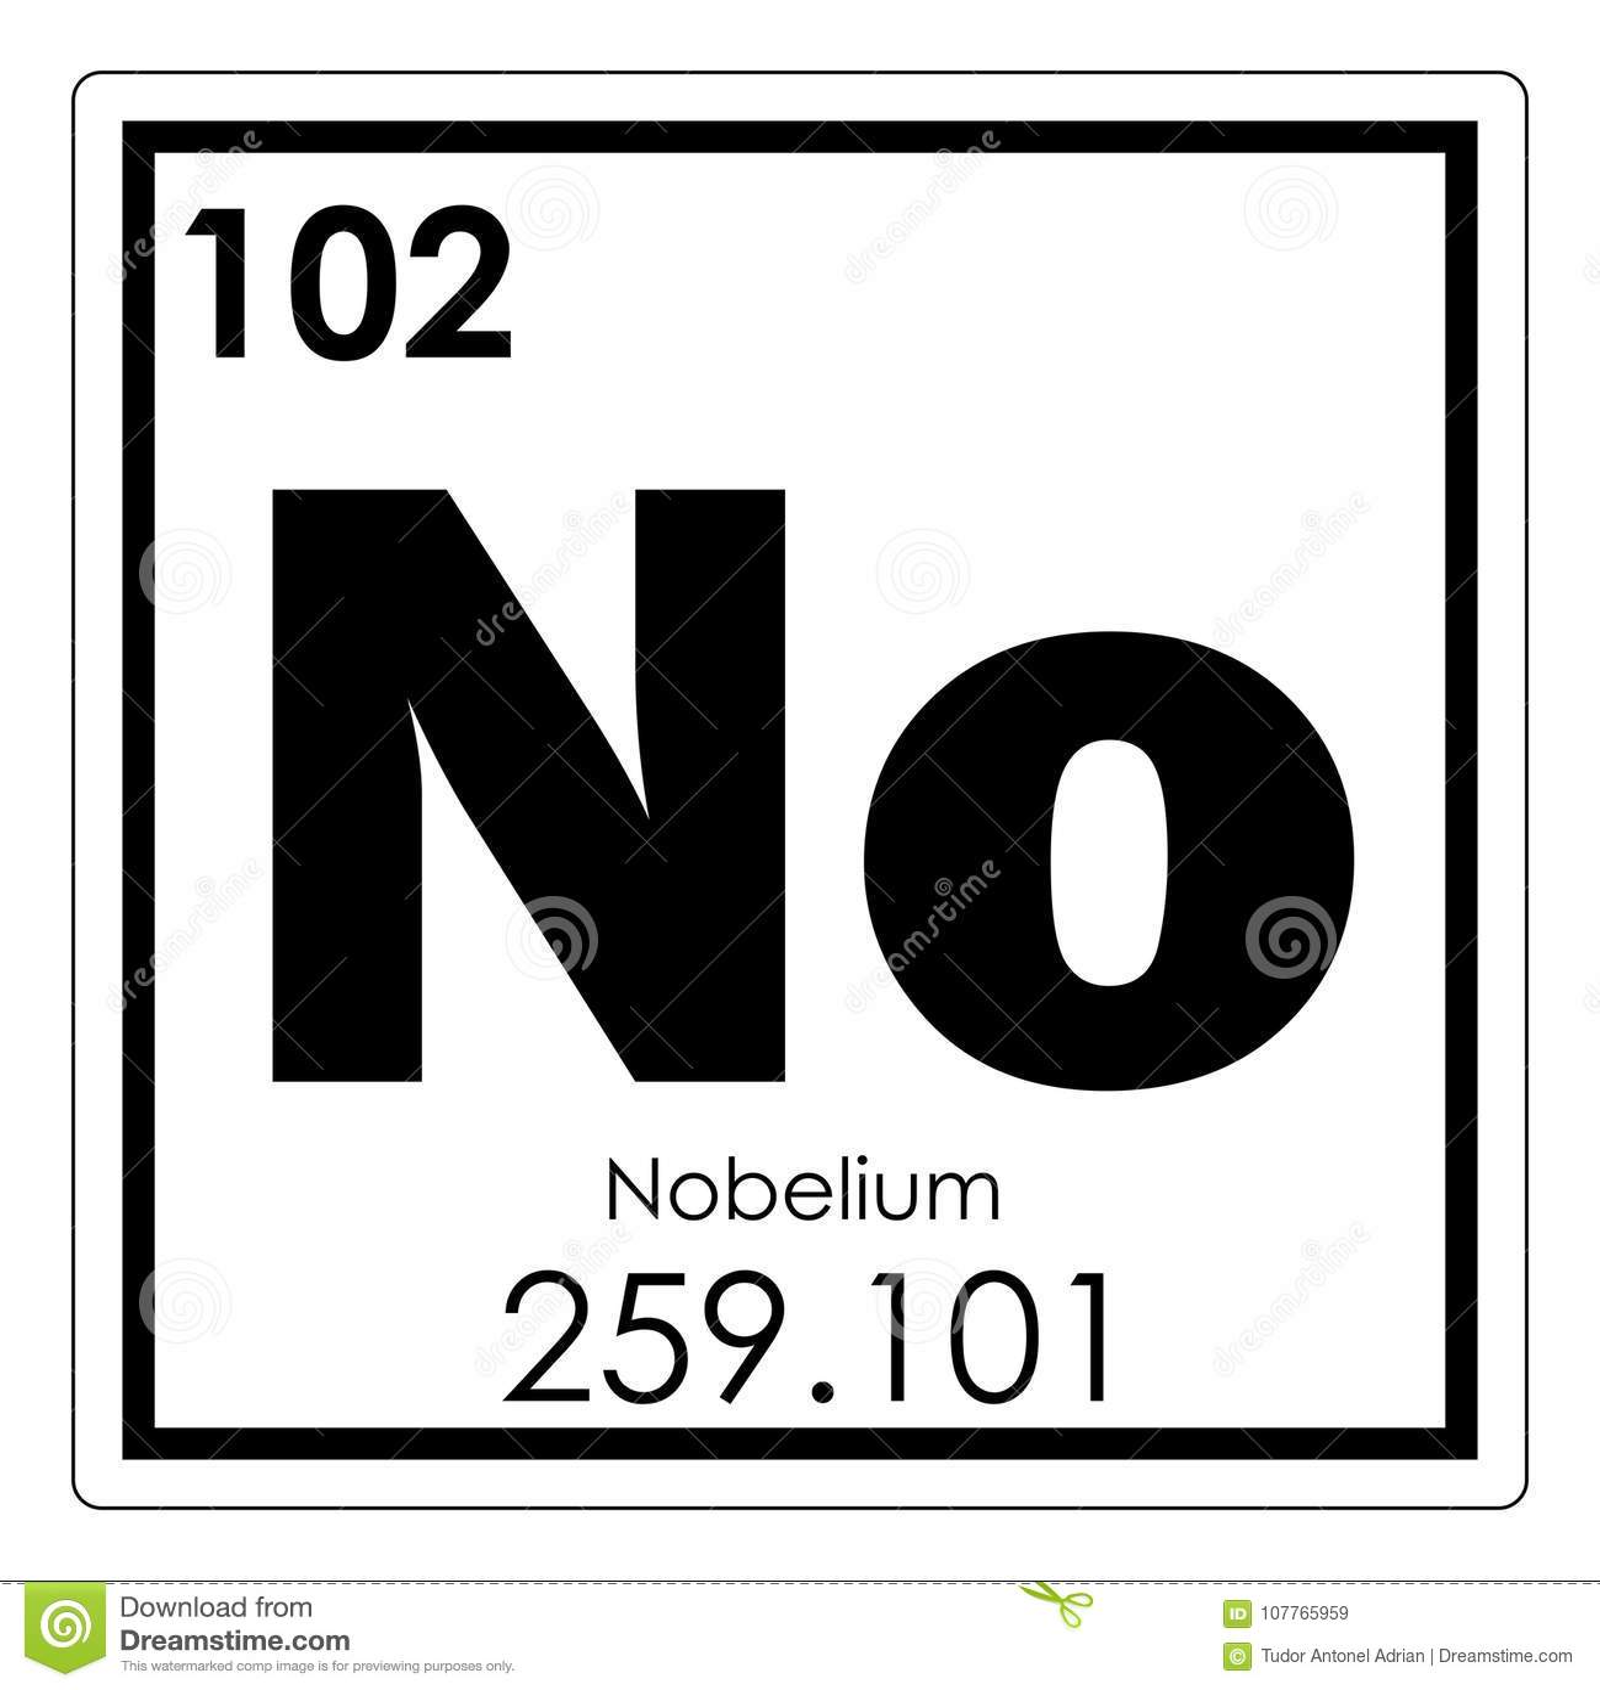 Nobelium Chemical Element Stock Illustration Illustration Of Geek